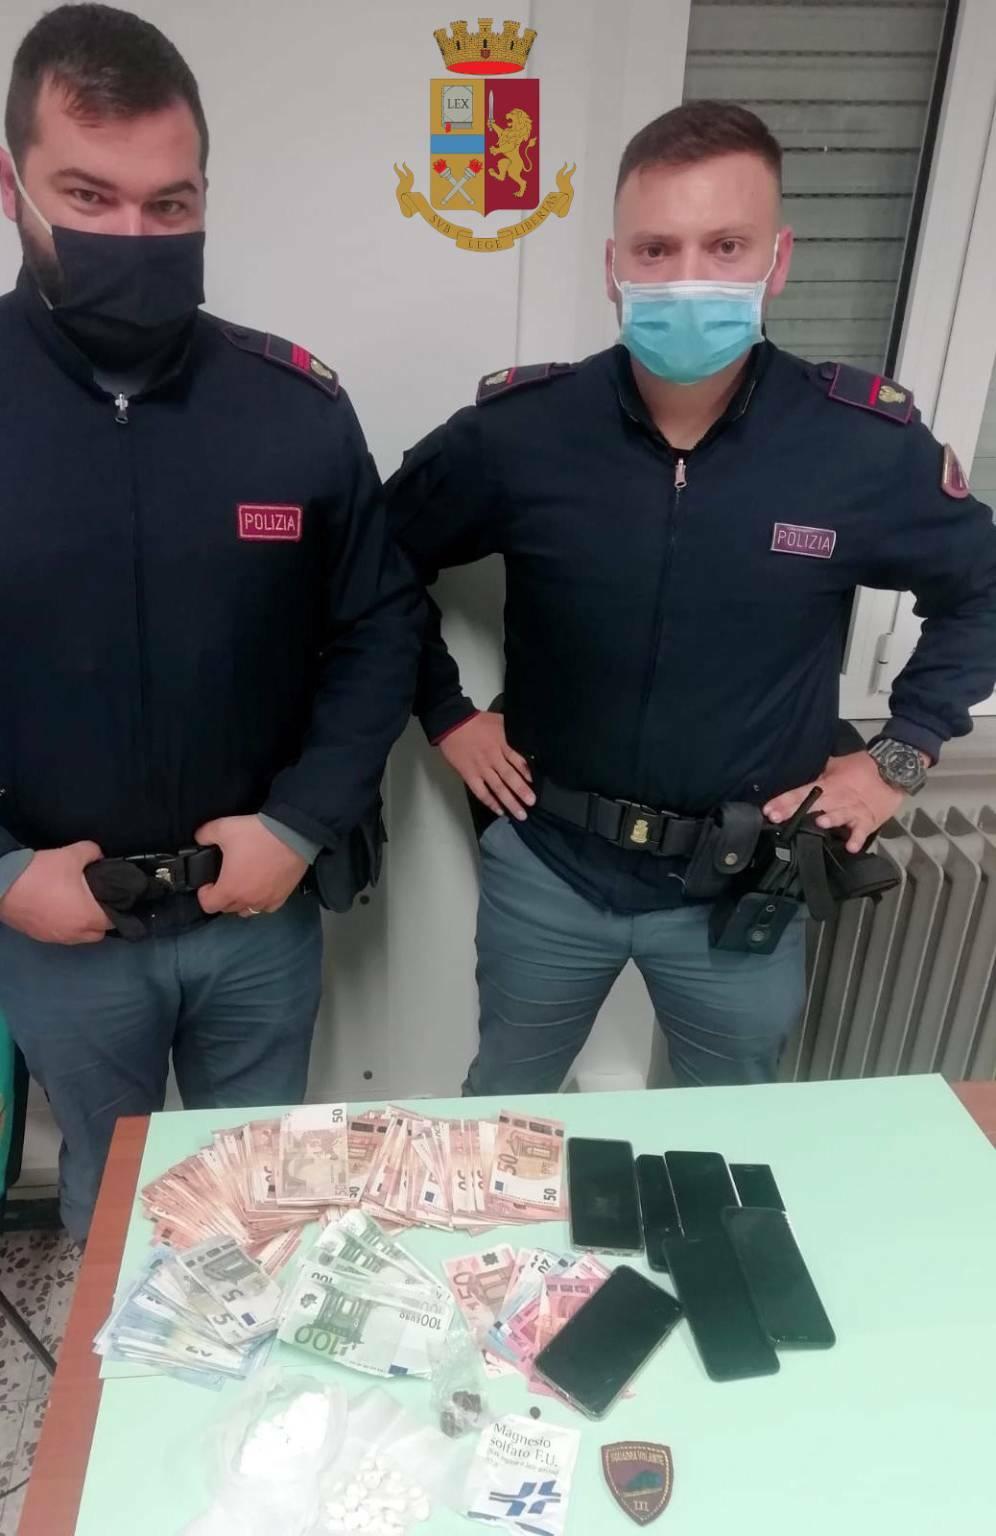 YouPol_Rimini_Polizia_2